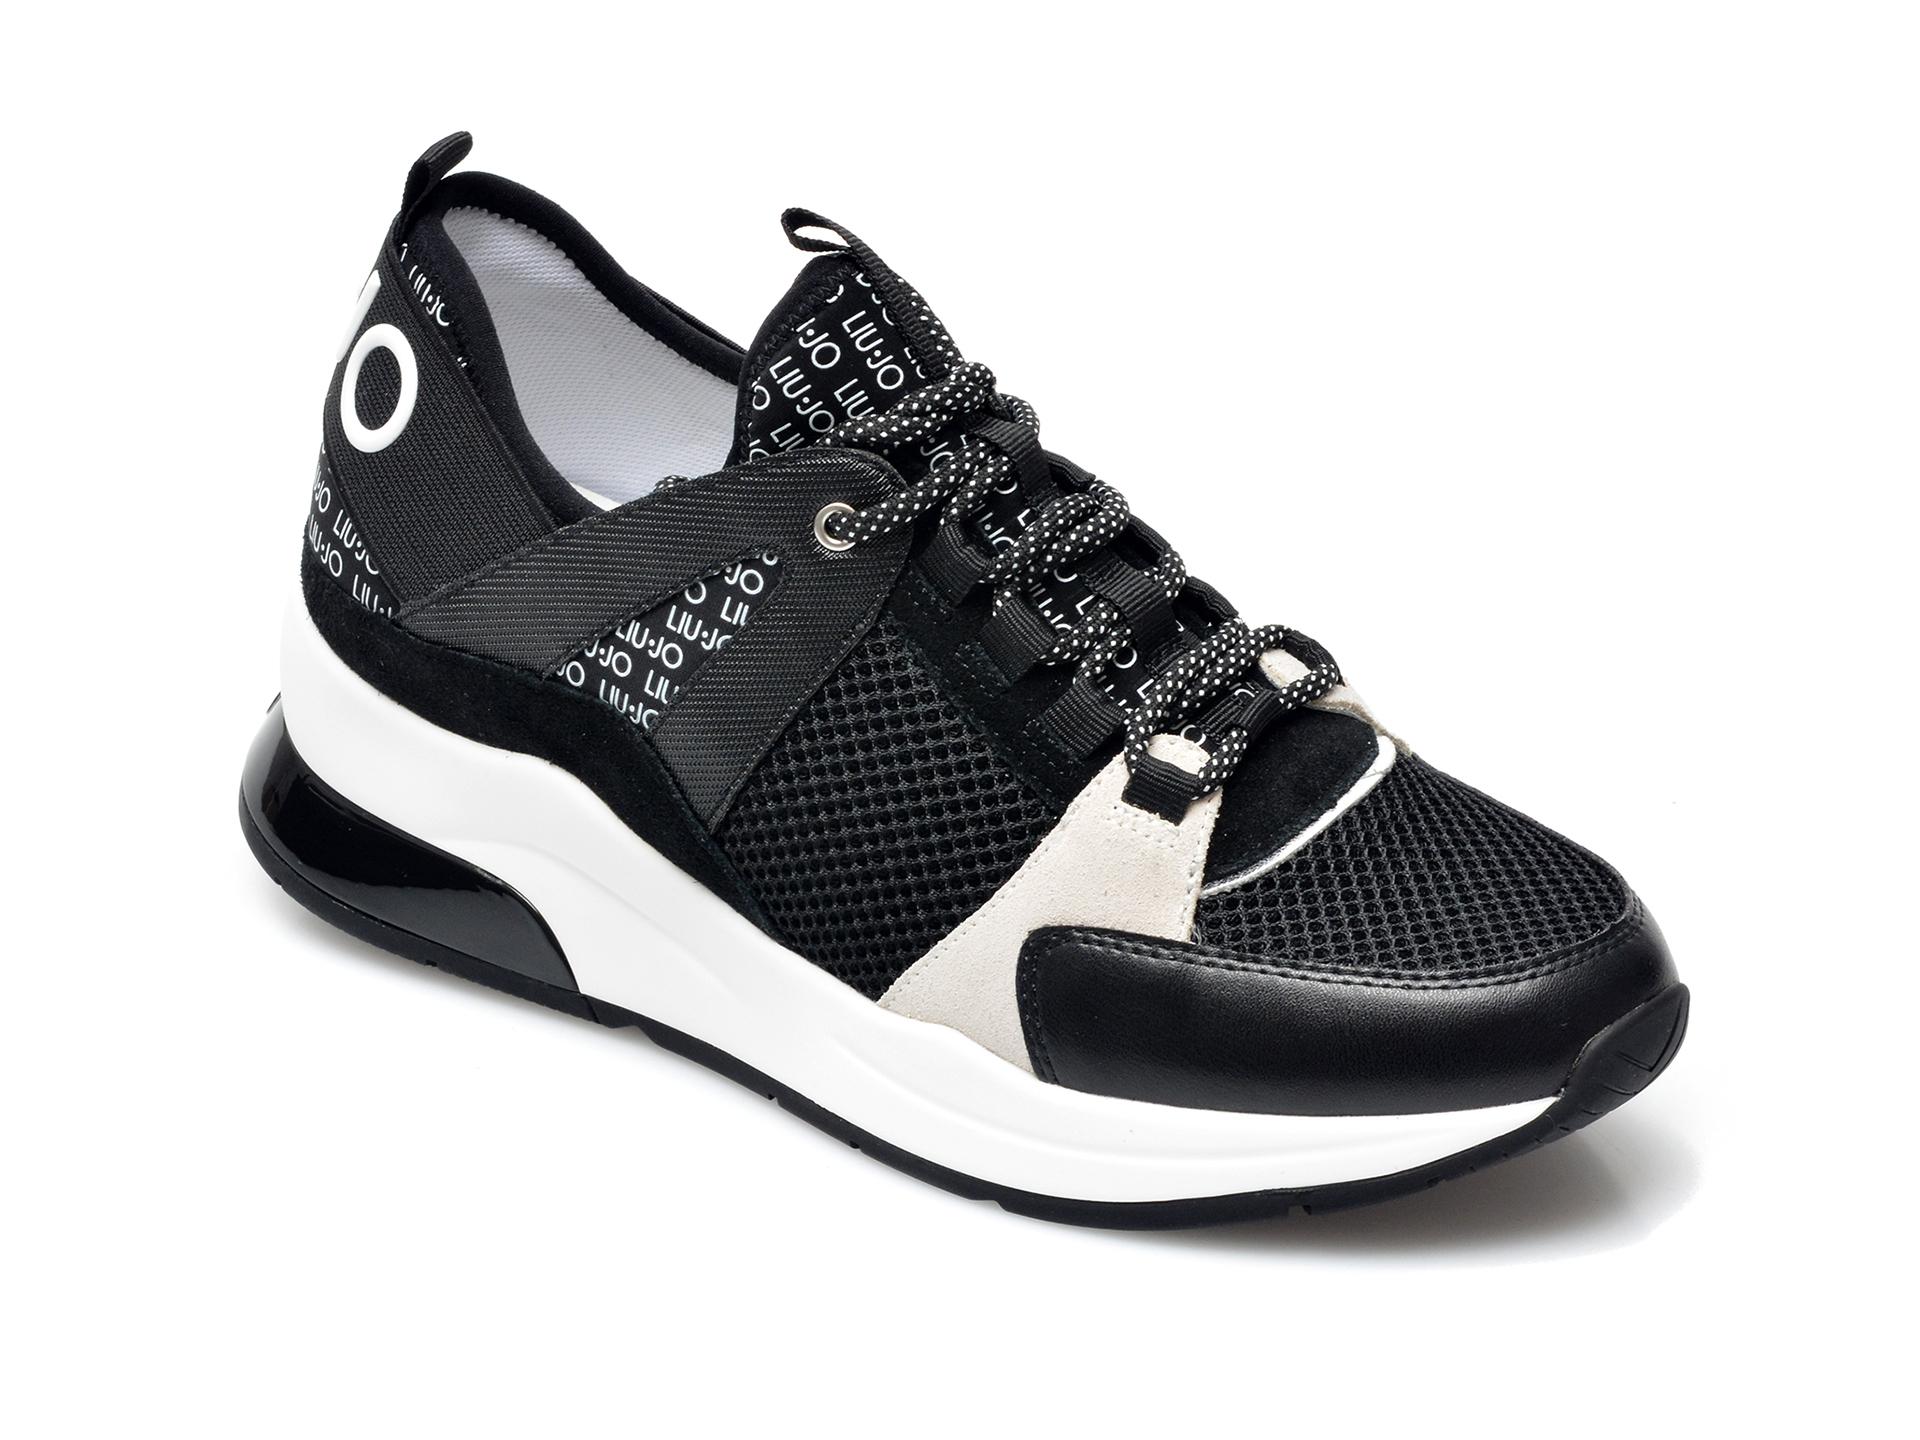 Pantofi sport LIU JO negri, Karlie 55, din material textil si piele intoarsa